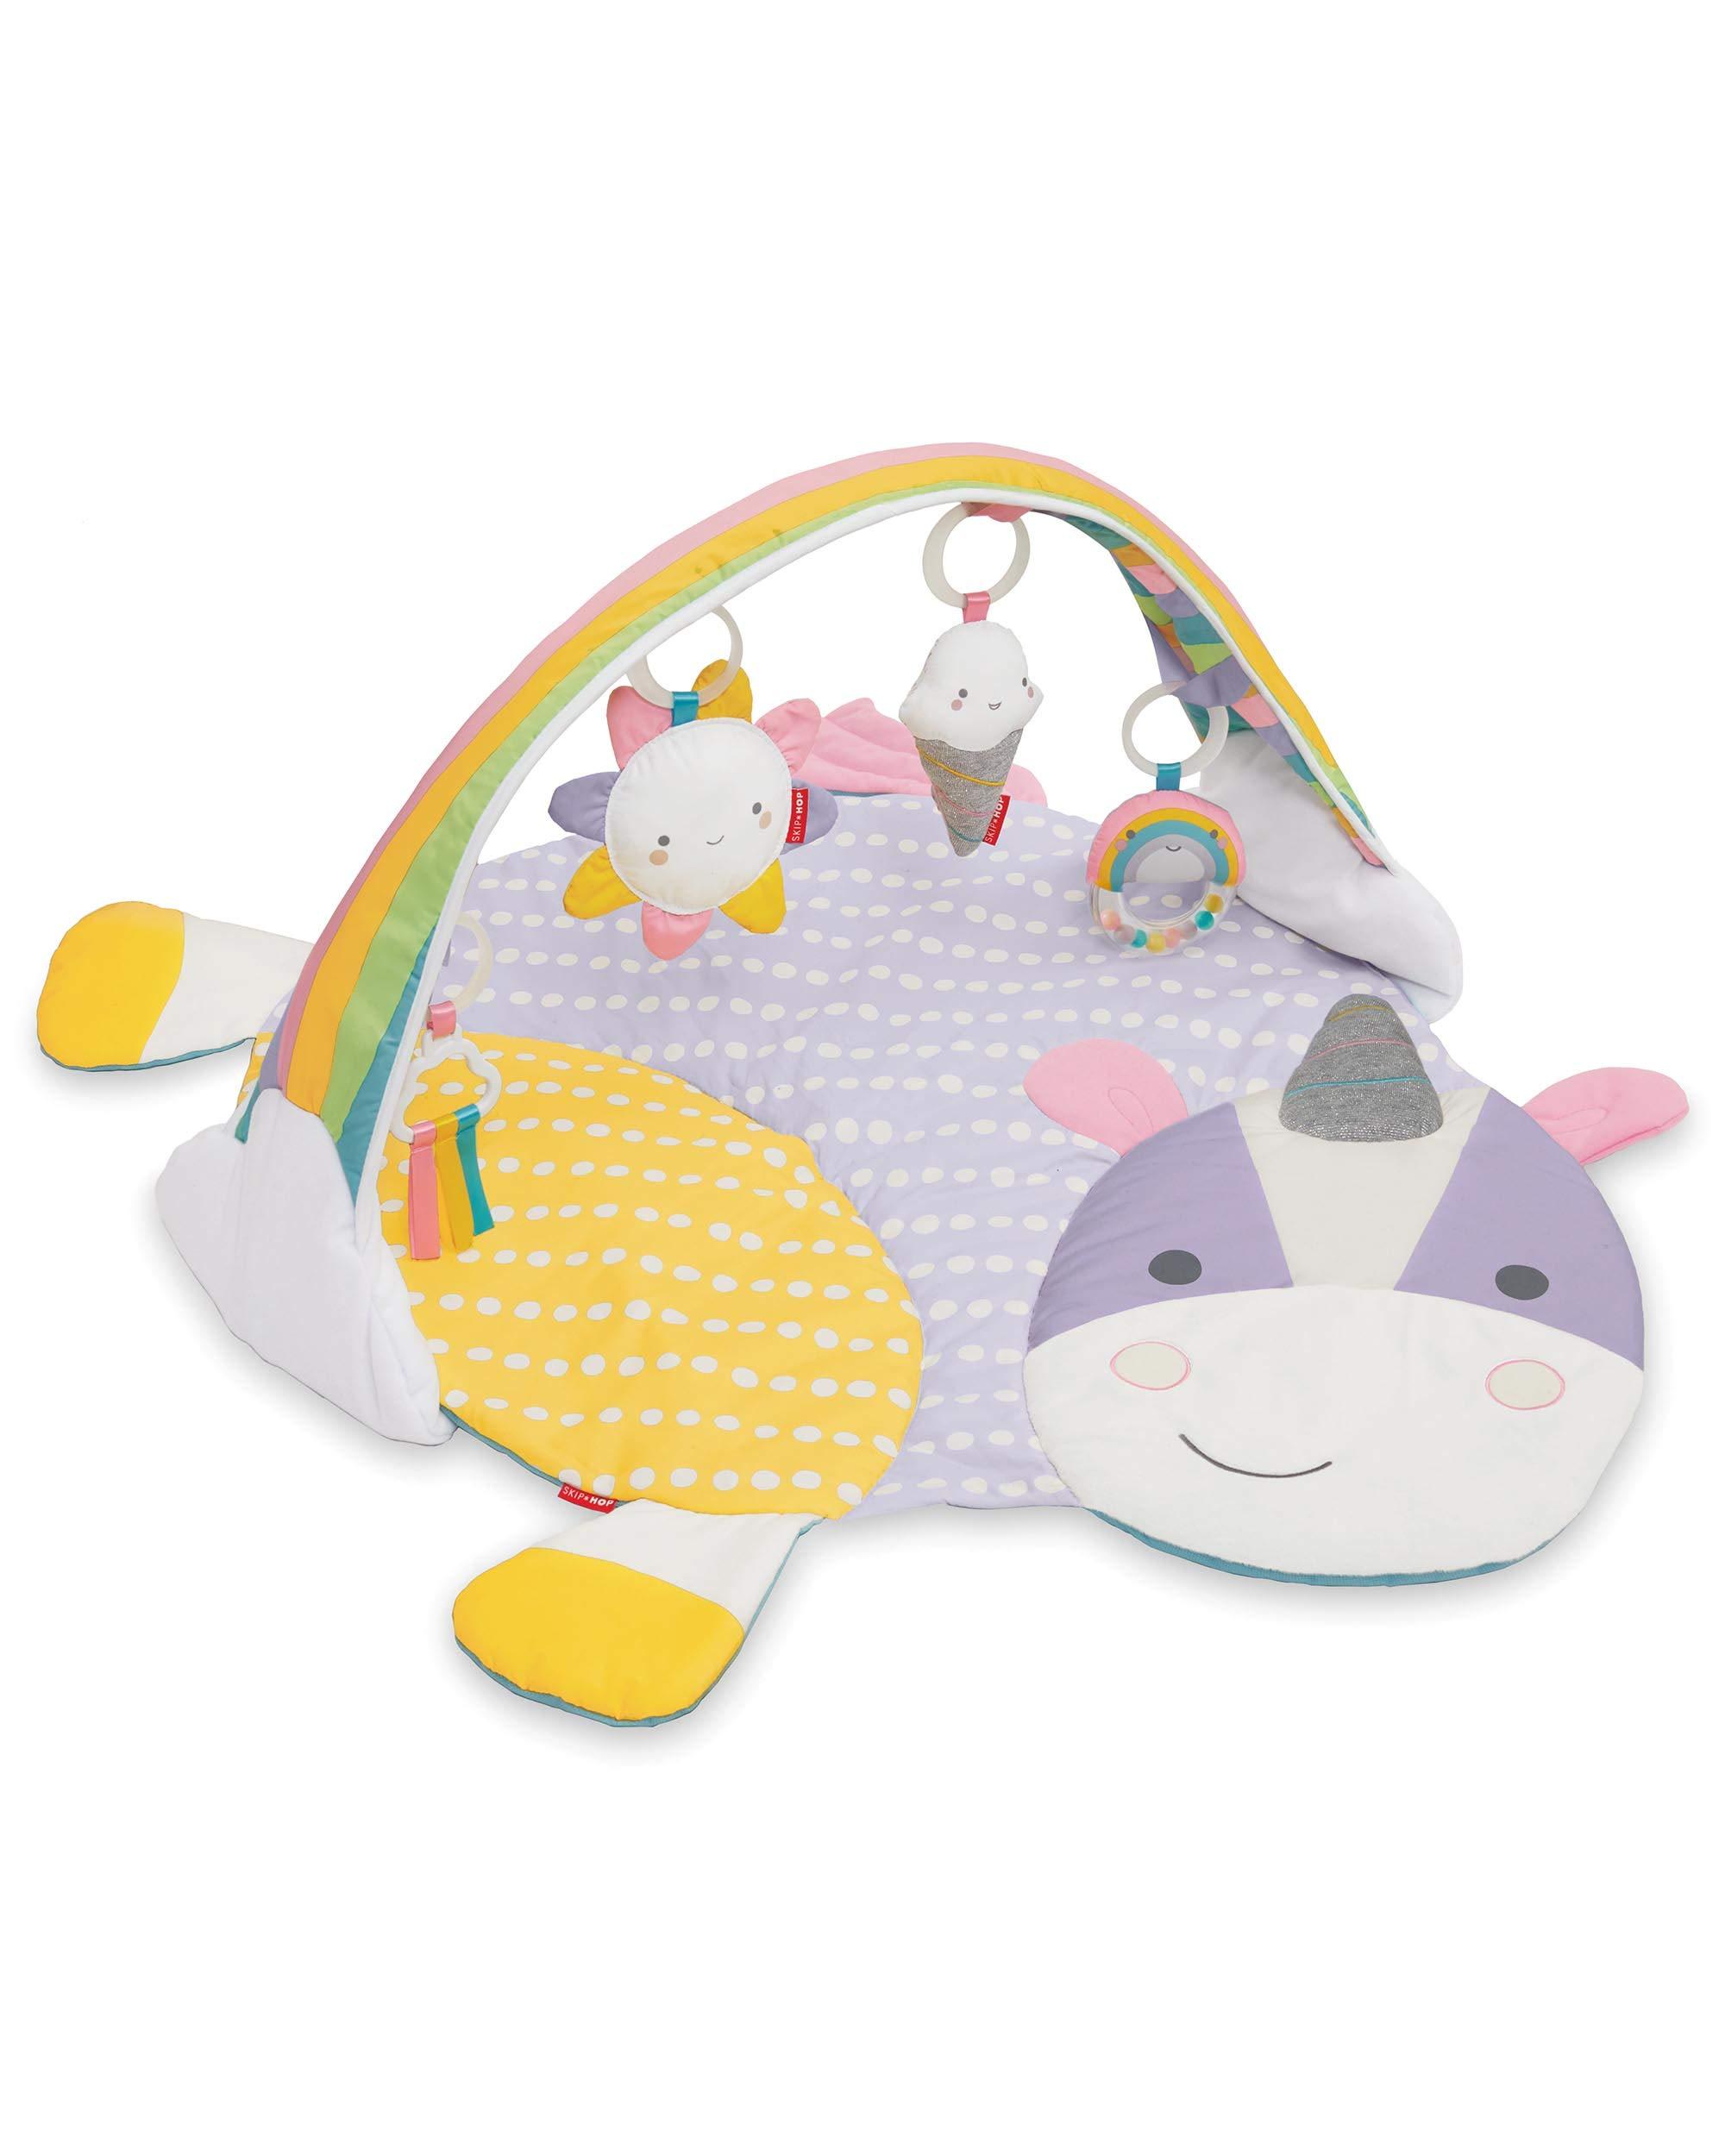 Skip Hop Eureka Unicorn Baby Play Mat Activity Gym, 24'' X 16.5''H, Multi Colored